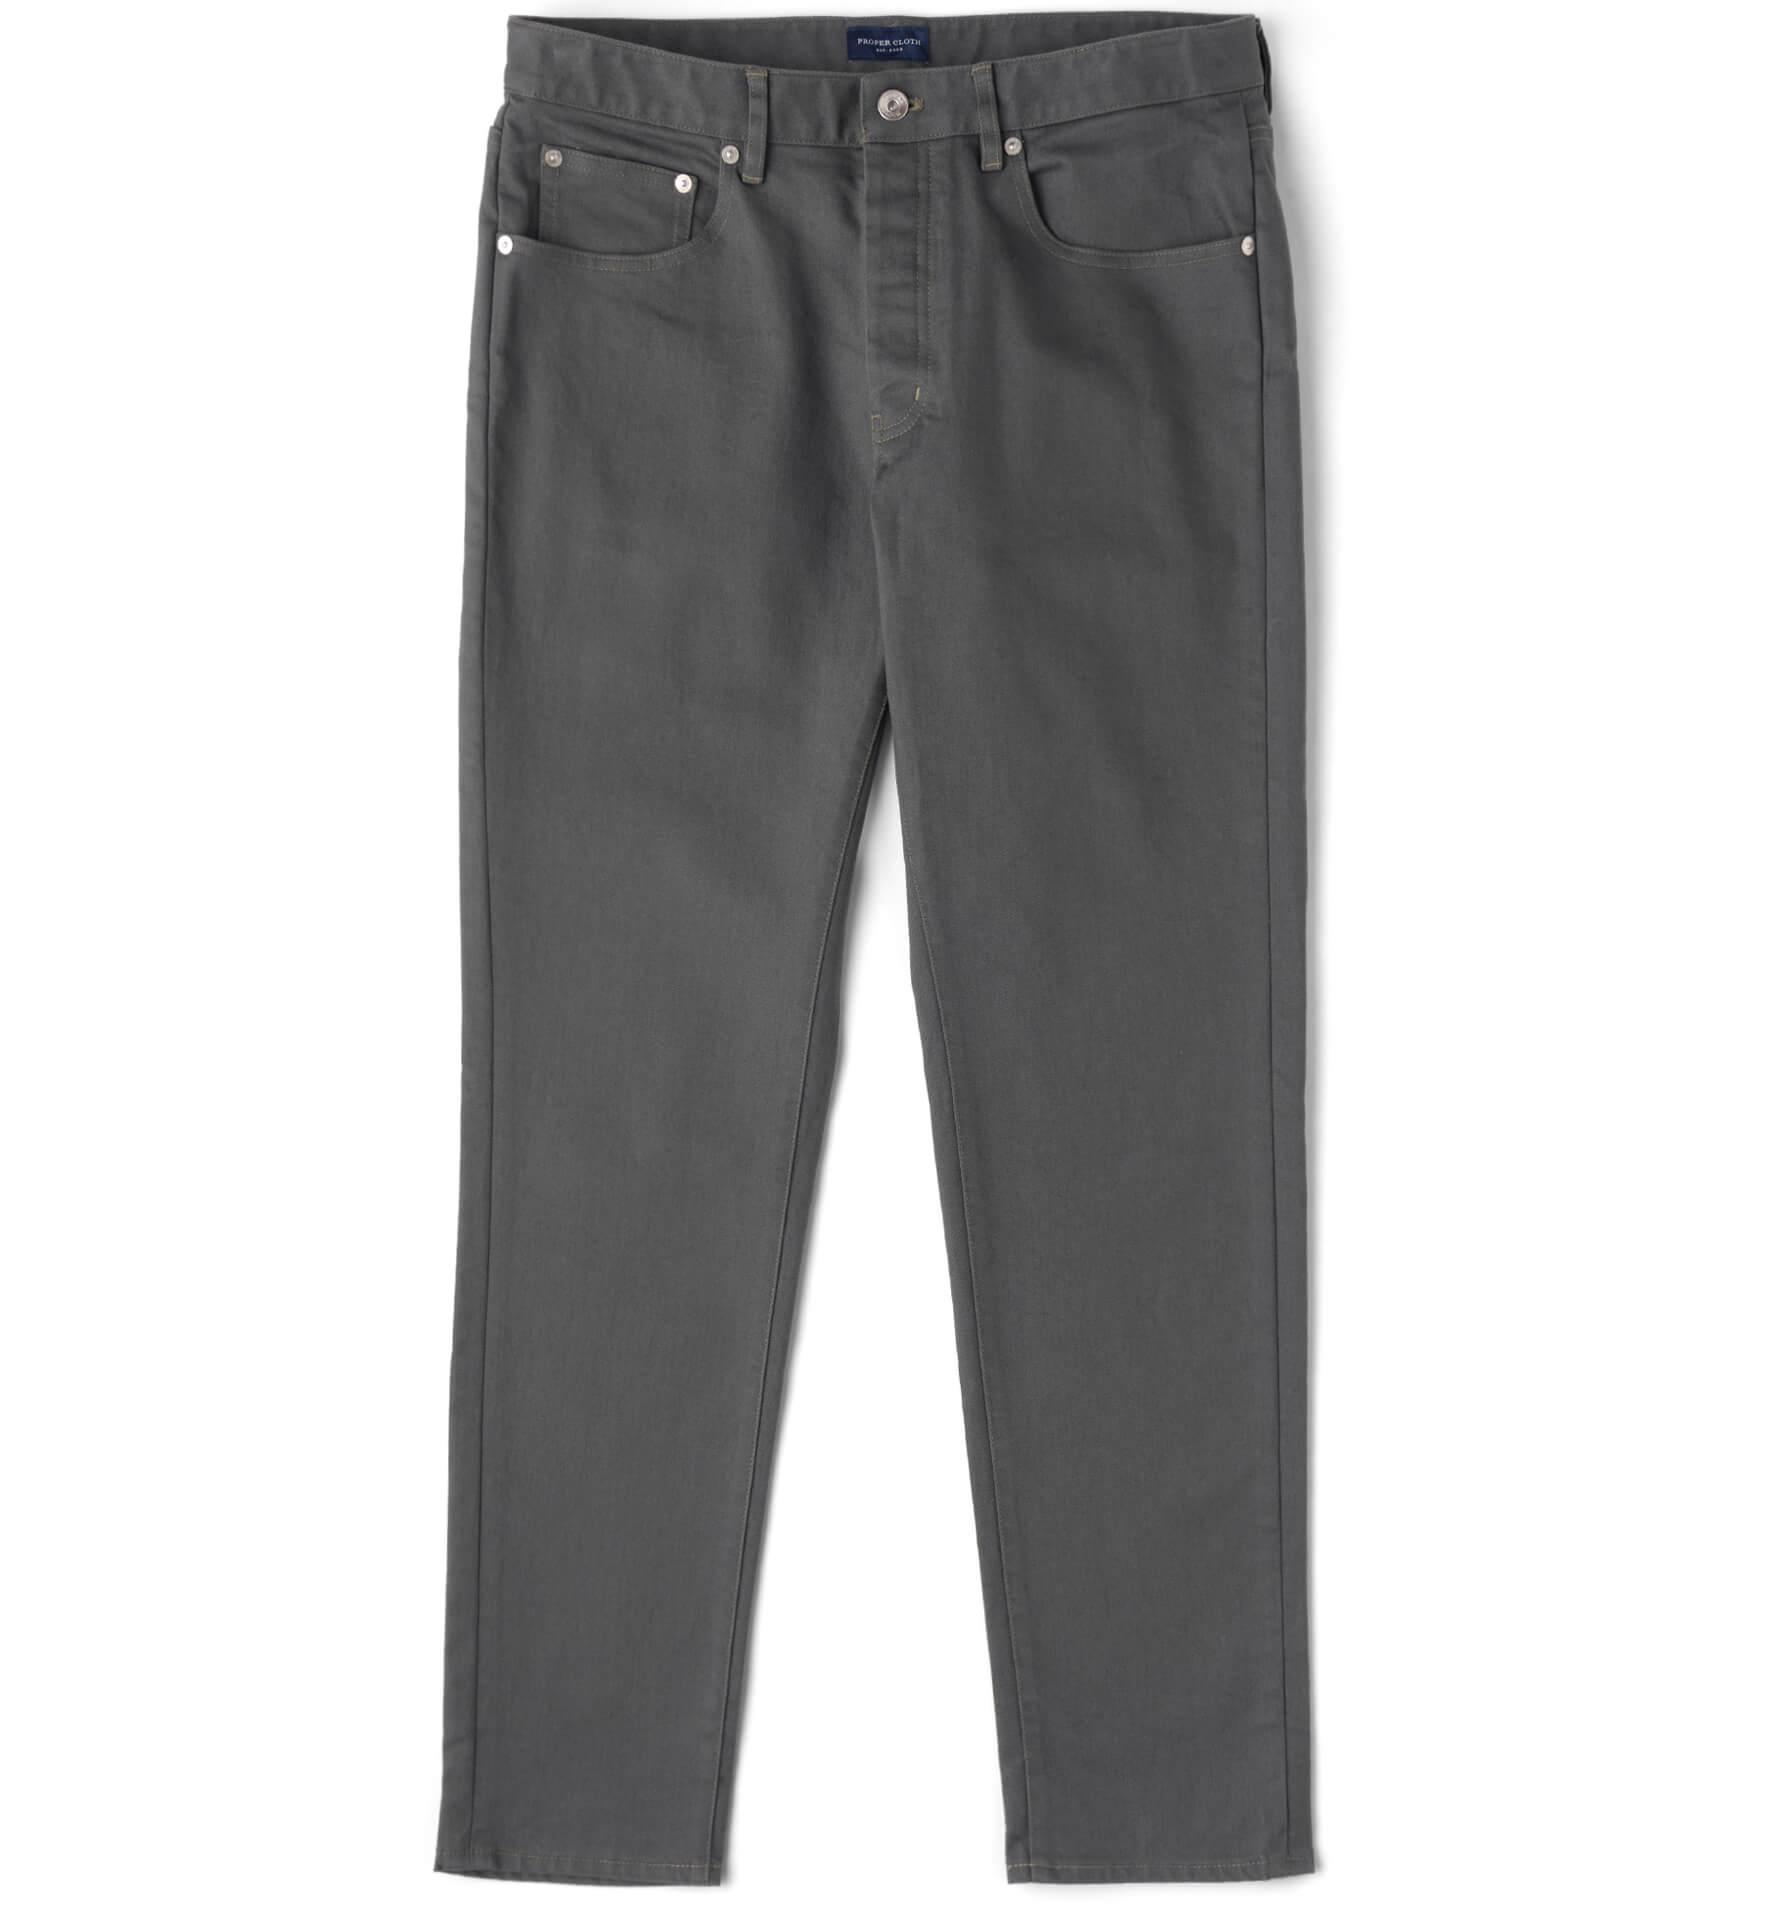 Zoom Image of Sullivan Charcoal Stretch Cotton Slub Twill Pant